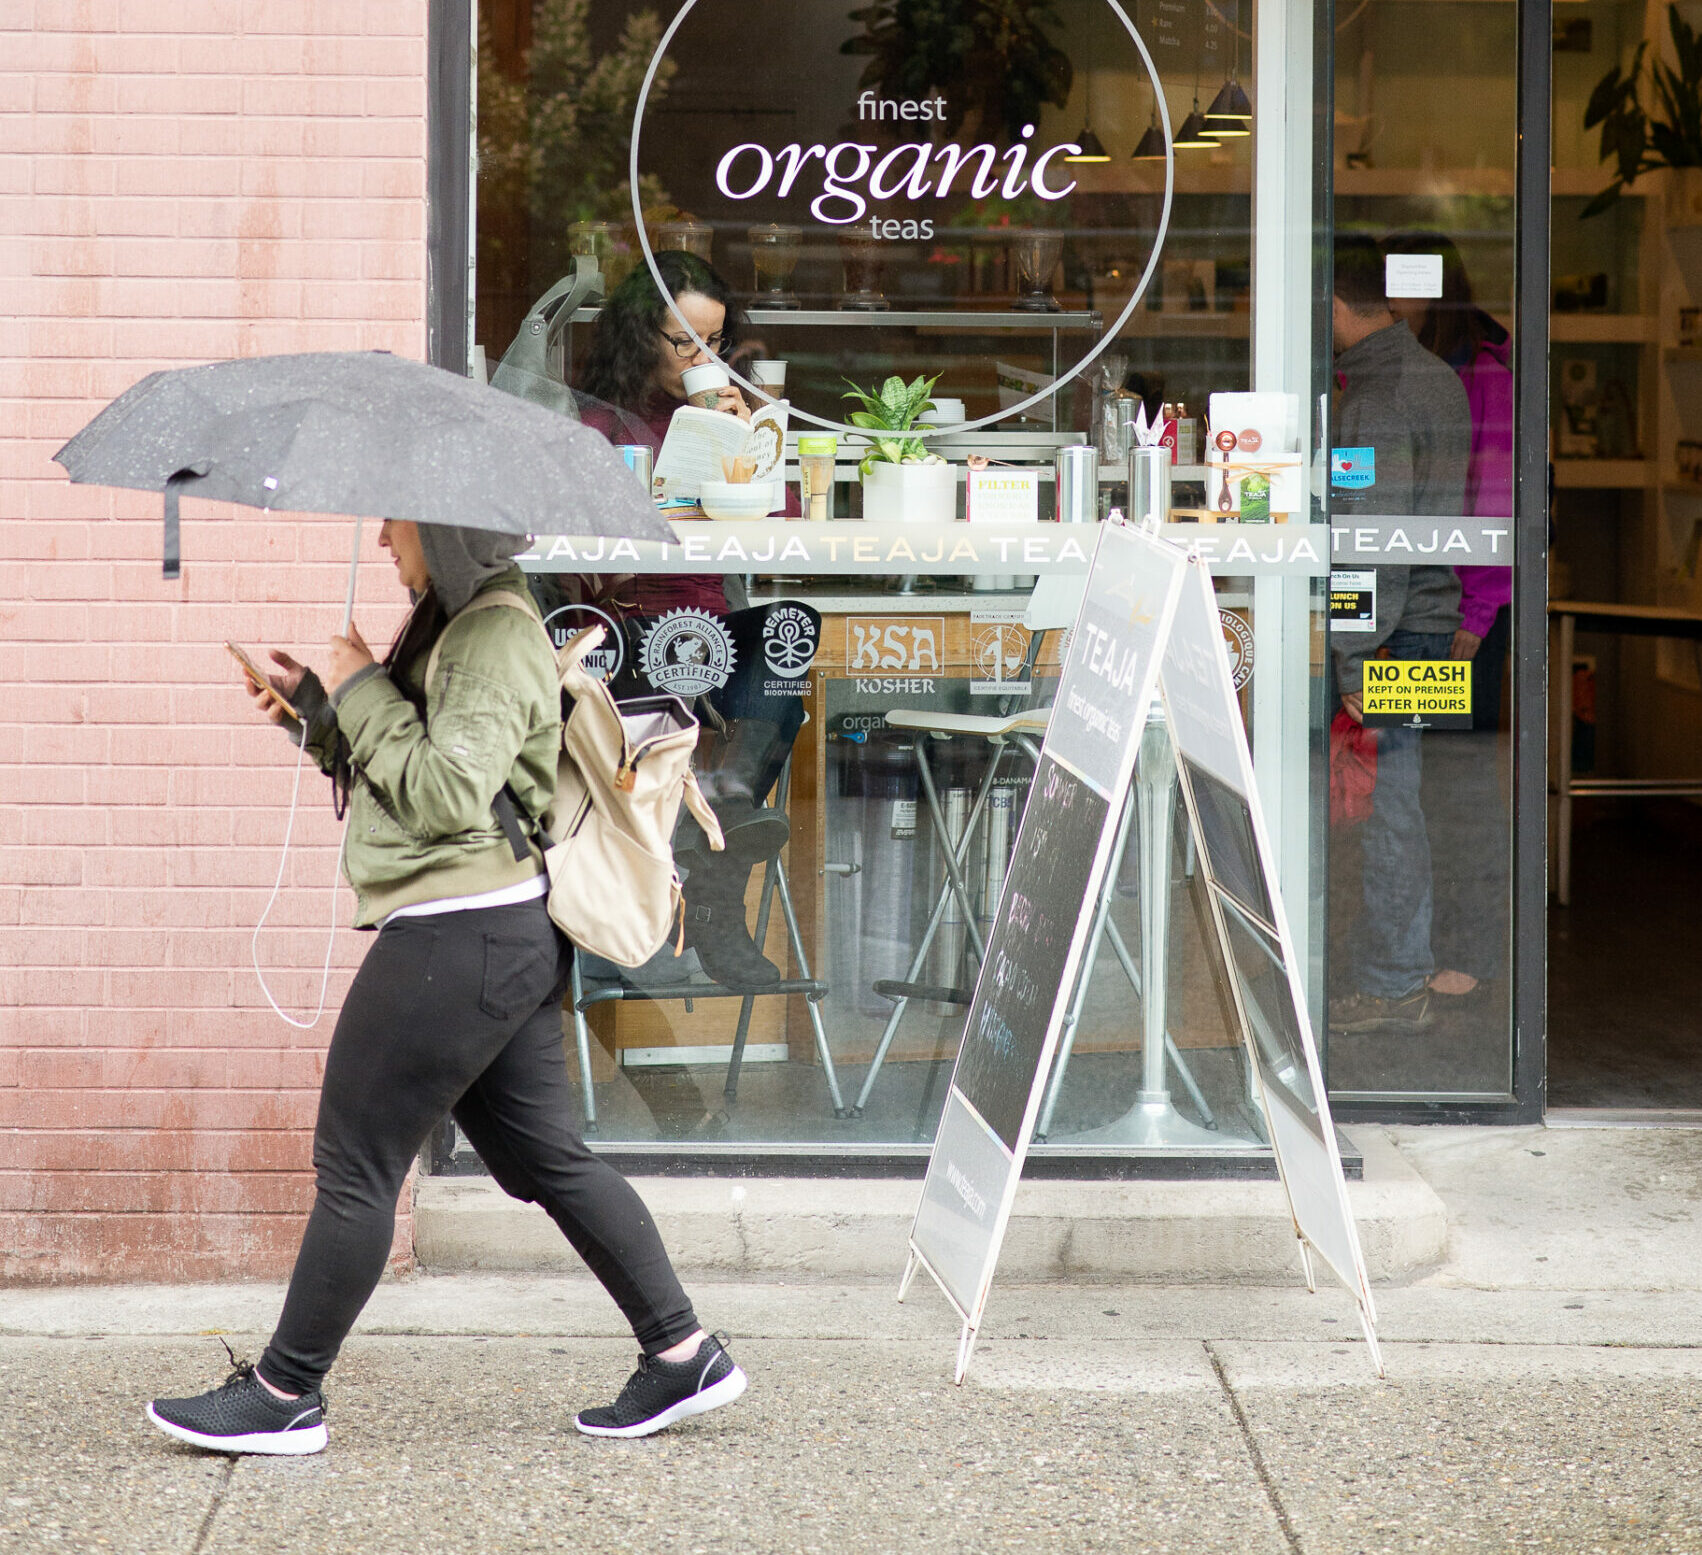 Walking the rain healthy benefits